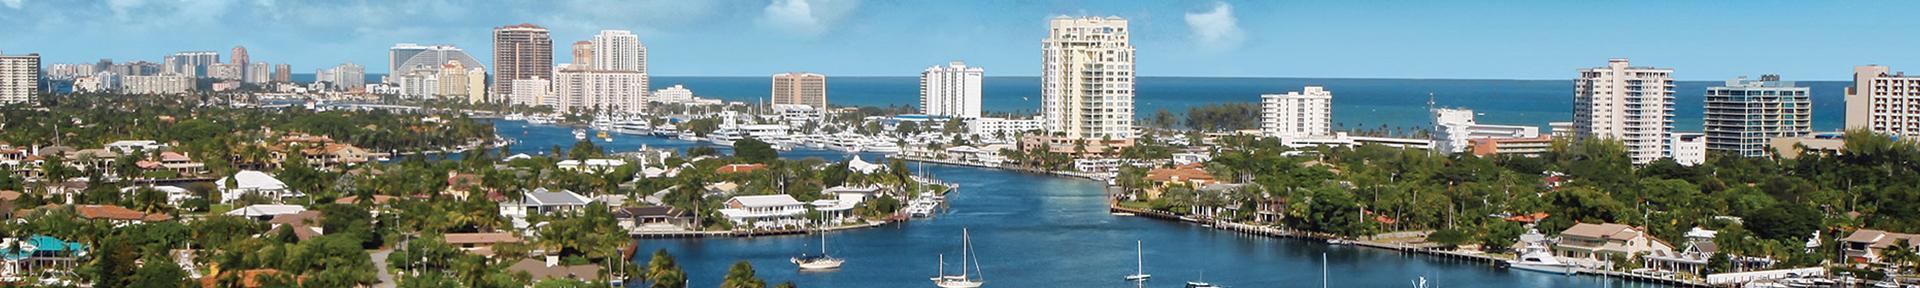 Moving South Florida